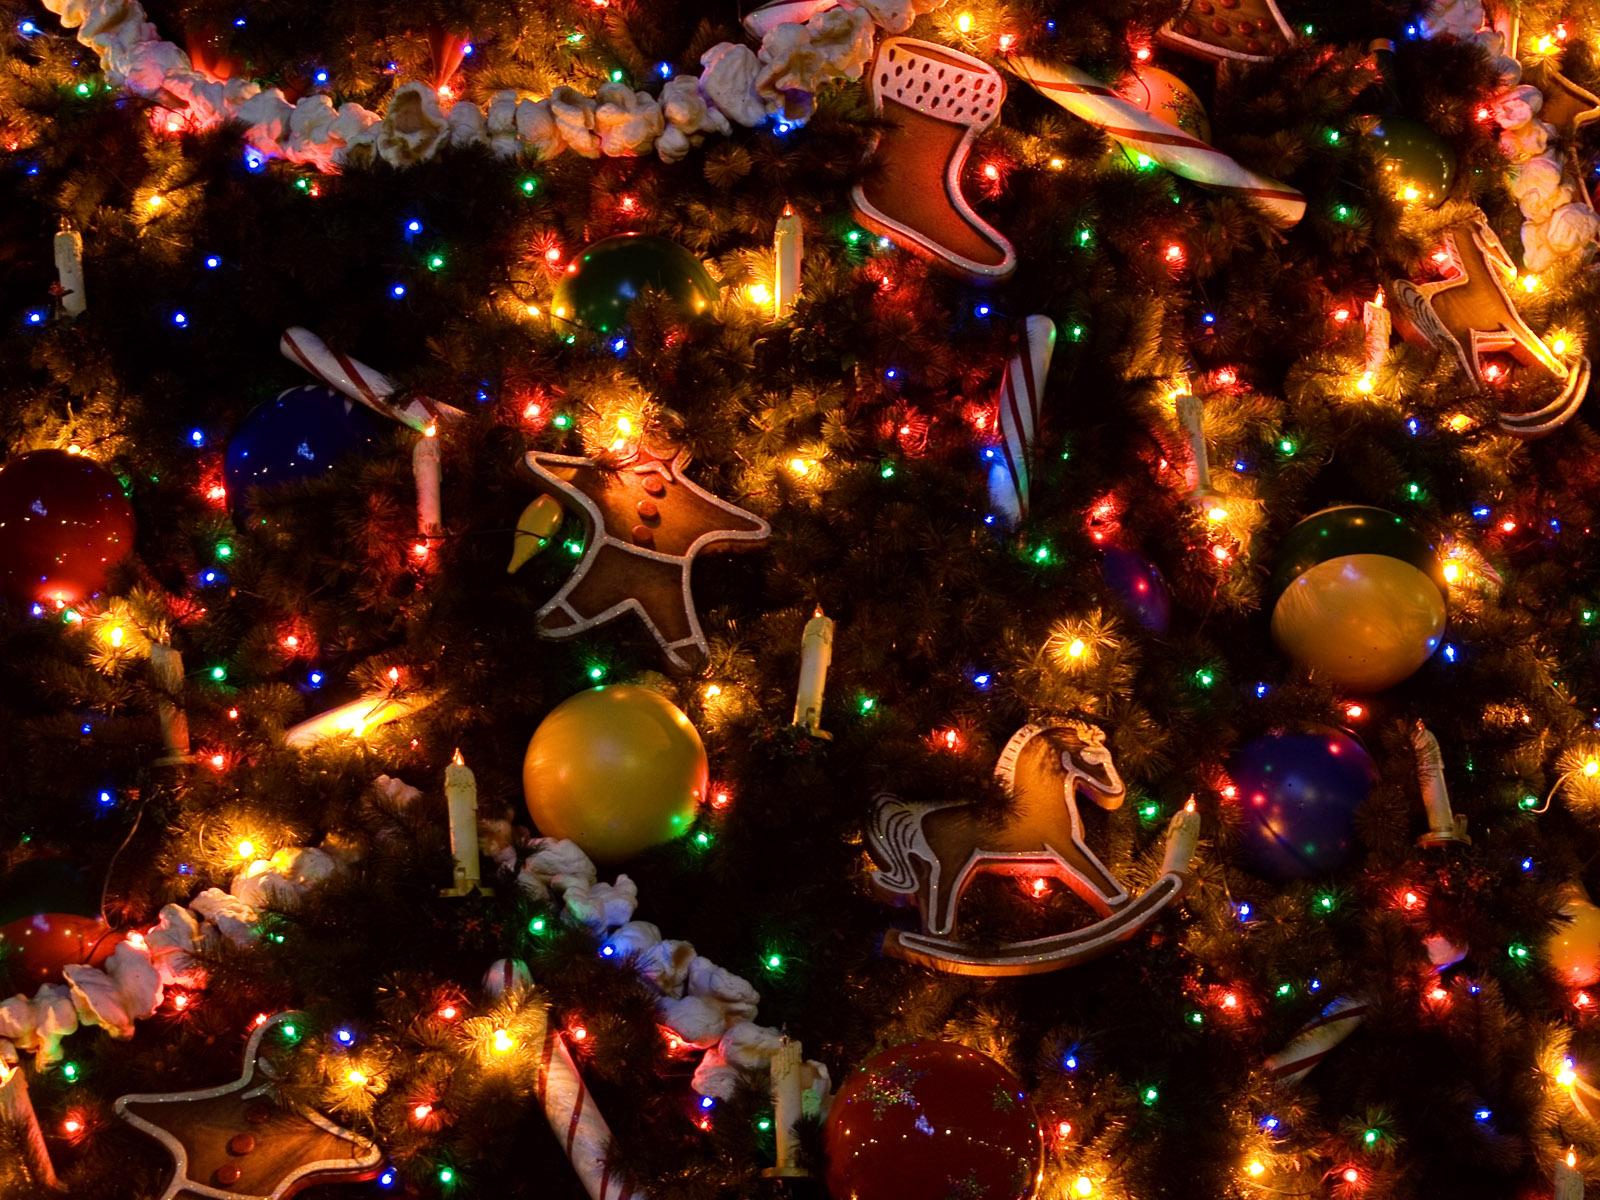 http://www.zastavki.com/pictures/1600x1200/2008/Christmas_wallpapers_Christmas_decorations___Christmas_011464_.jpg